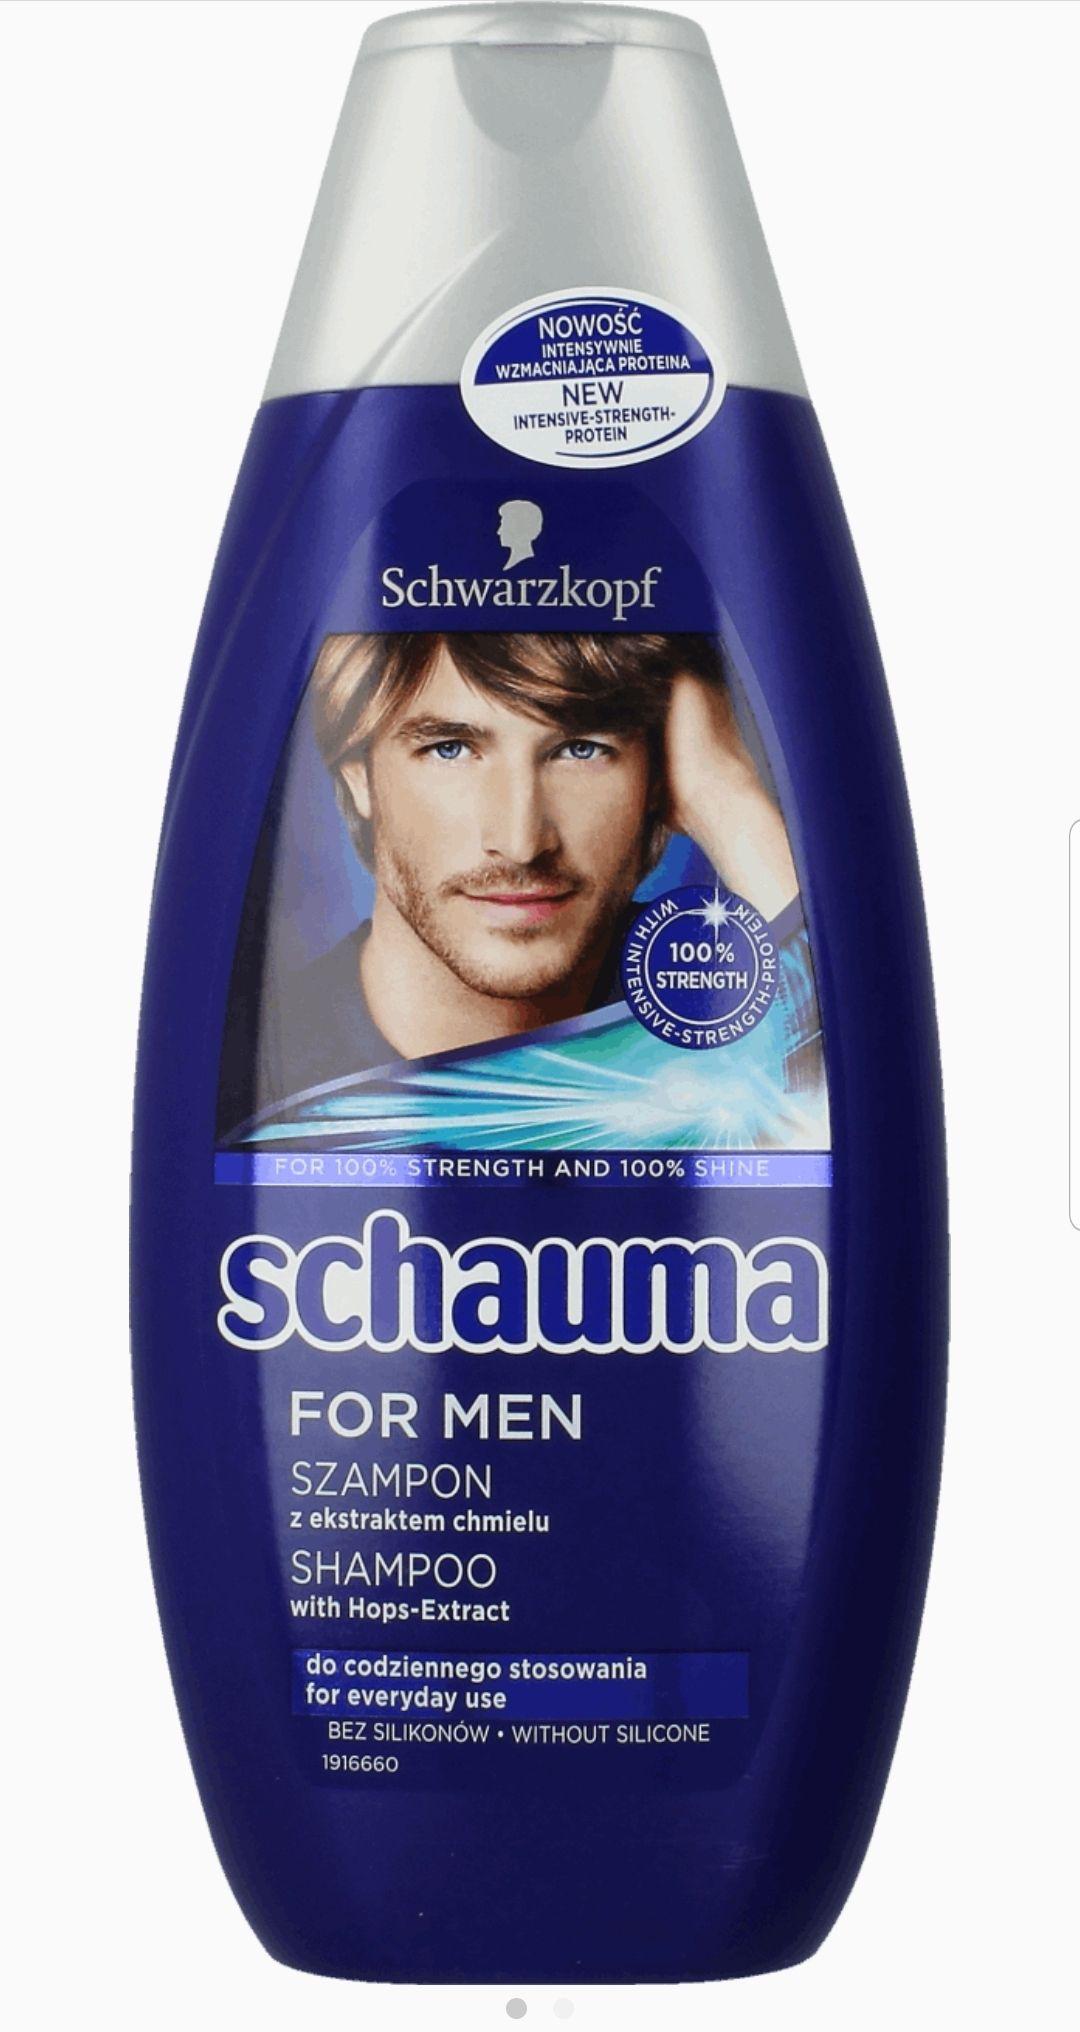 Szampon SCHAUMA FOR MEN. Rossmann